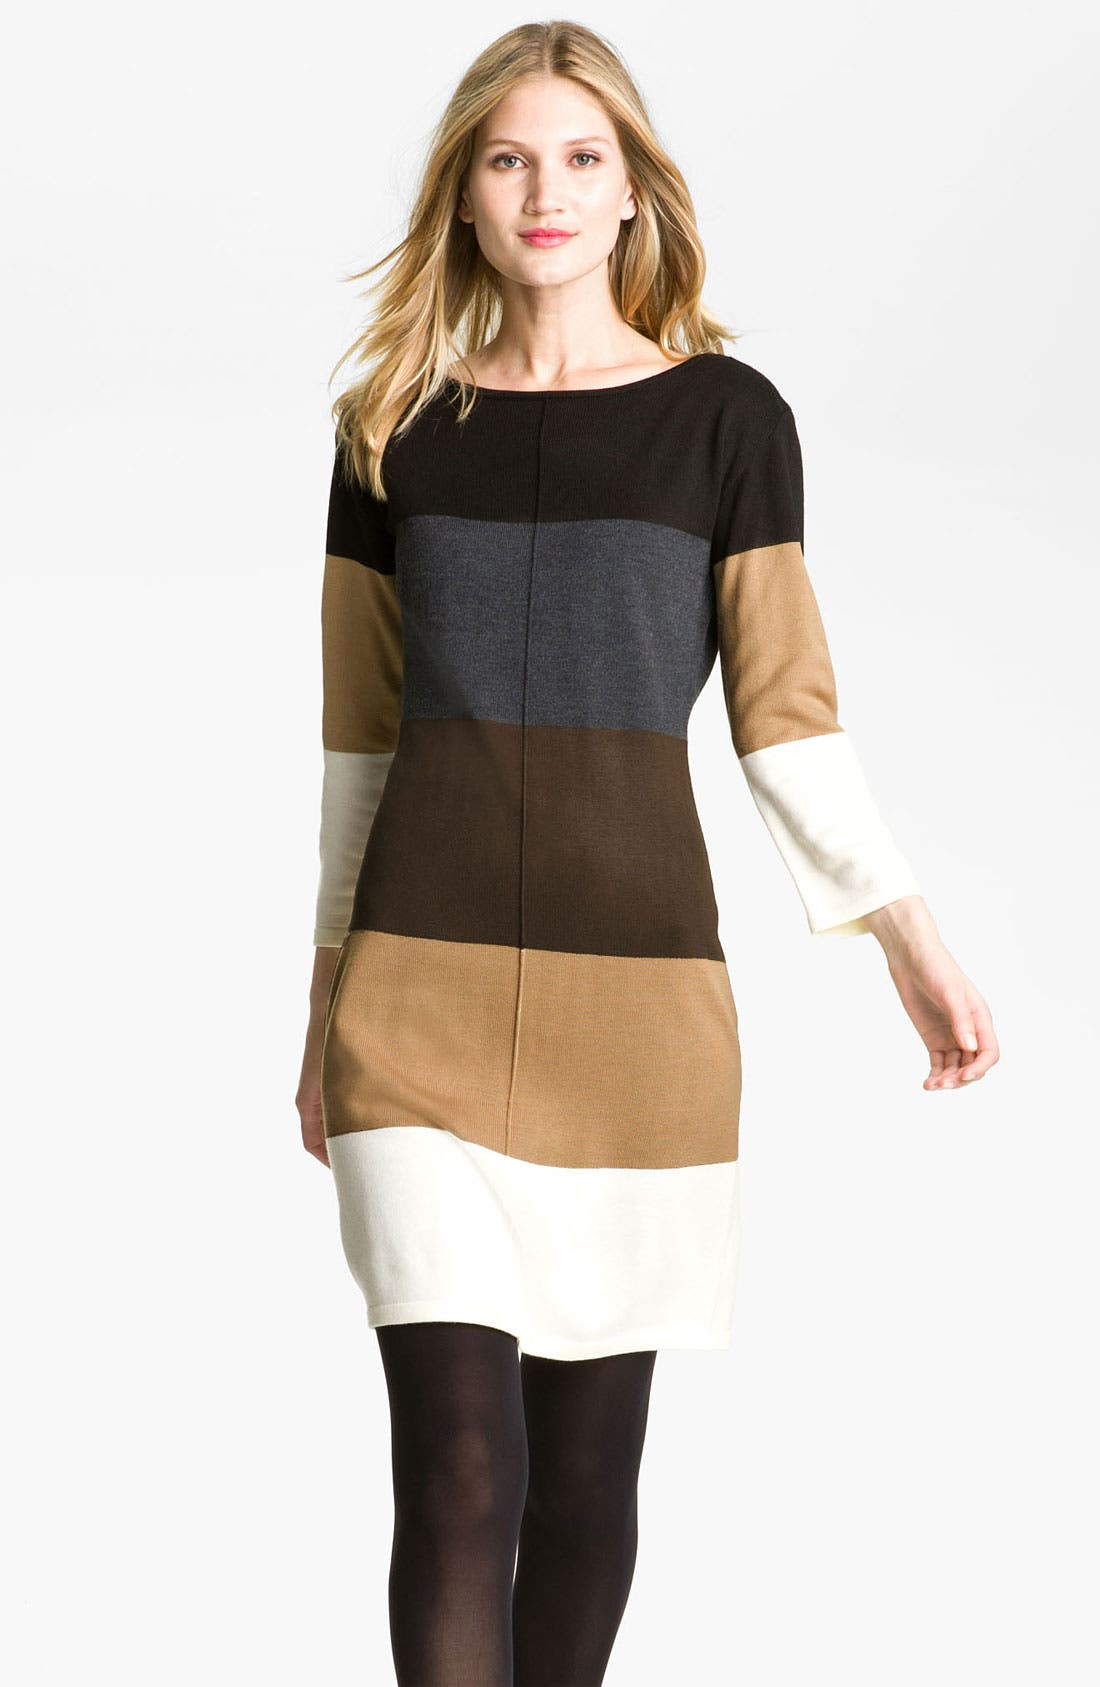 Alternate Image 1 Selected - Calvin Klein Colorblock Sweater Dress